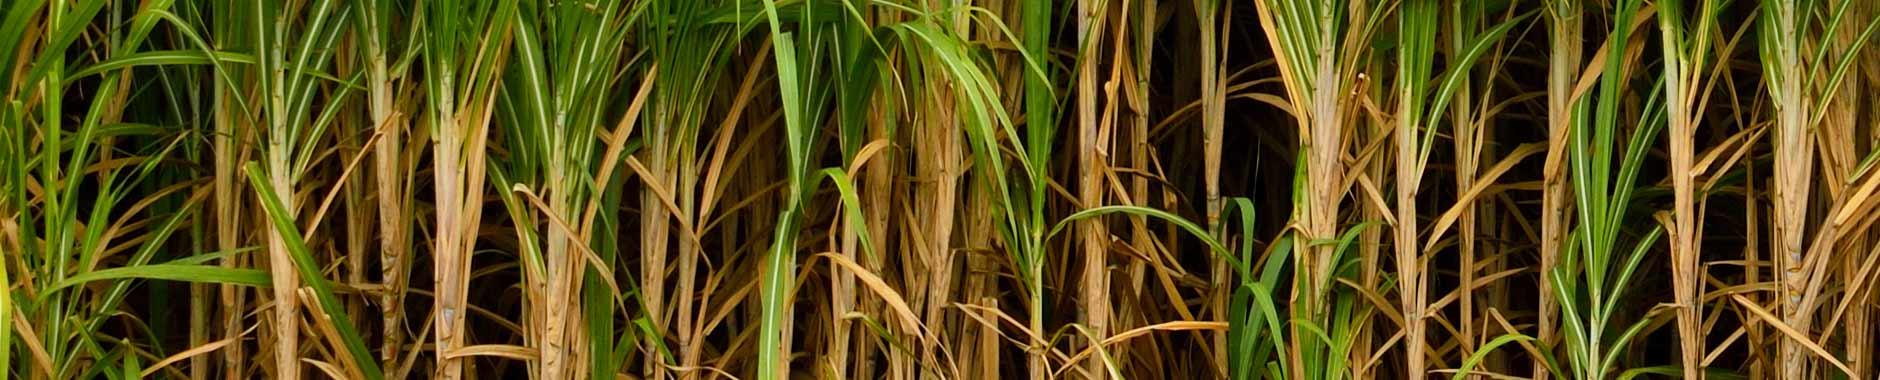 https://storage.googleapis.com/rocky-esss-co/sitewp/2019/04/7931bad9-bg-sugarcane-bagasse.jpg